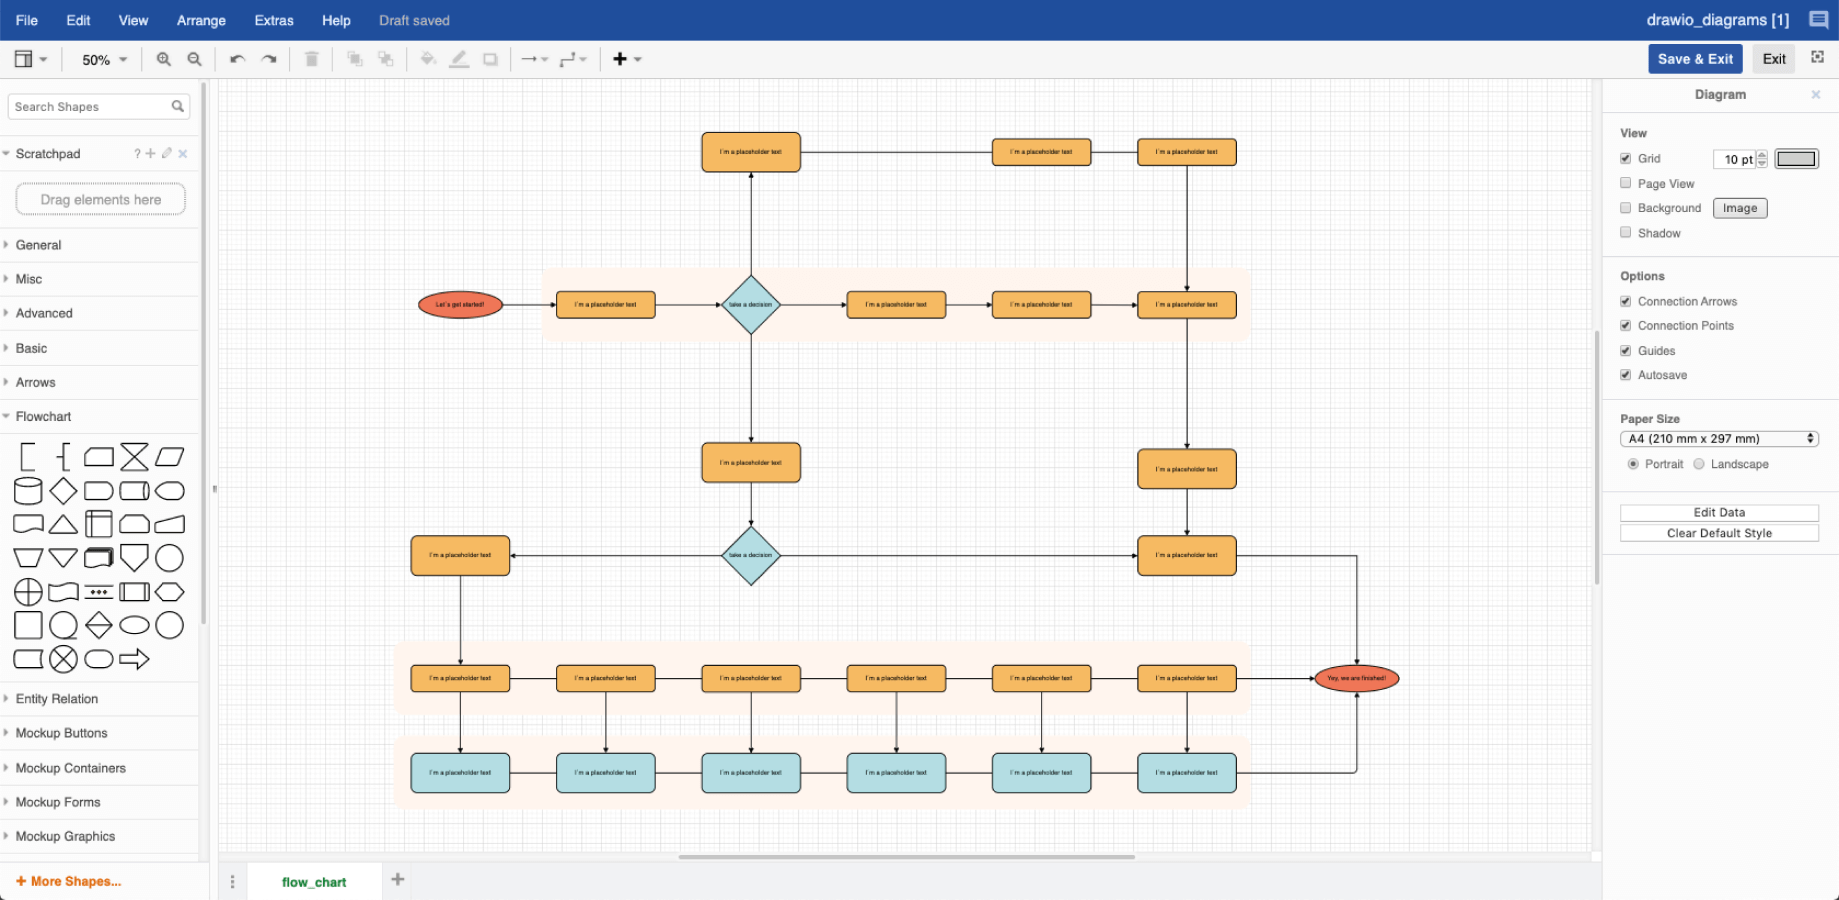 Diagrama de amostra de processo cortesia do Draw.io